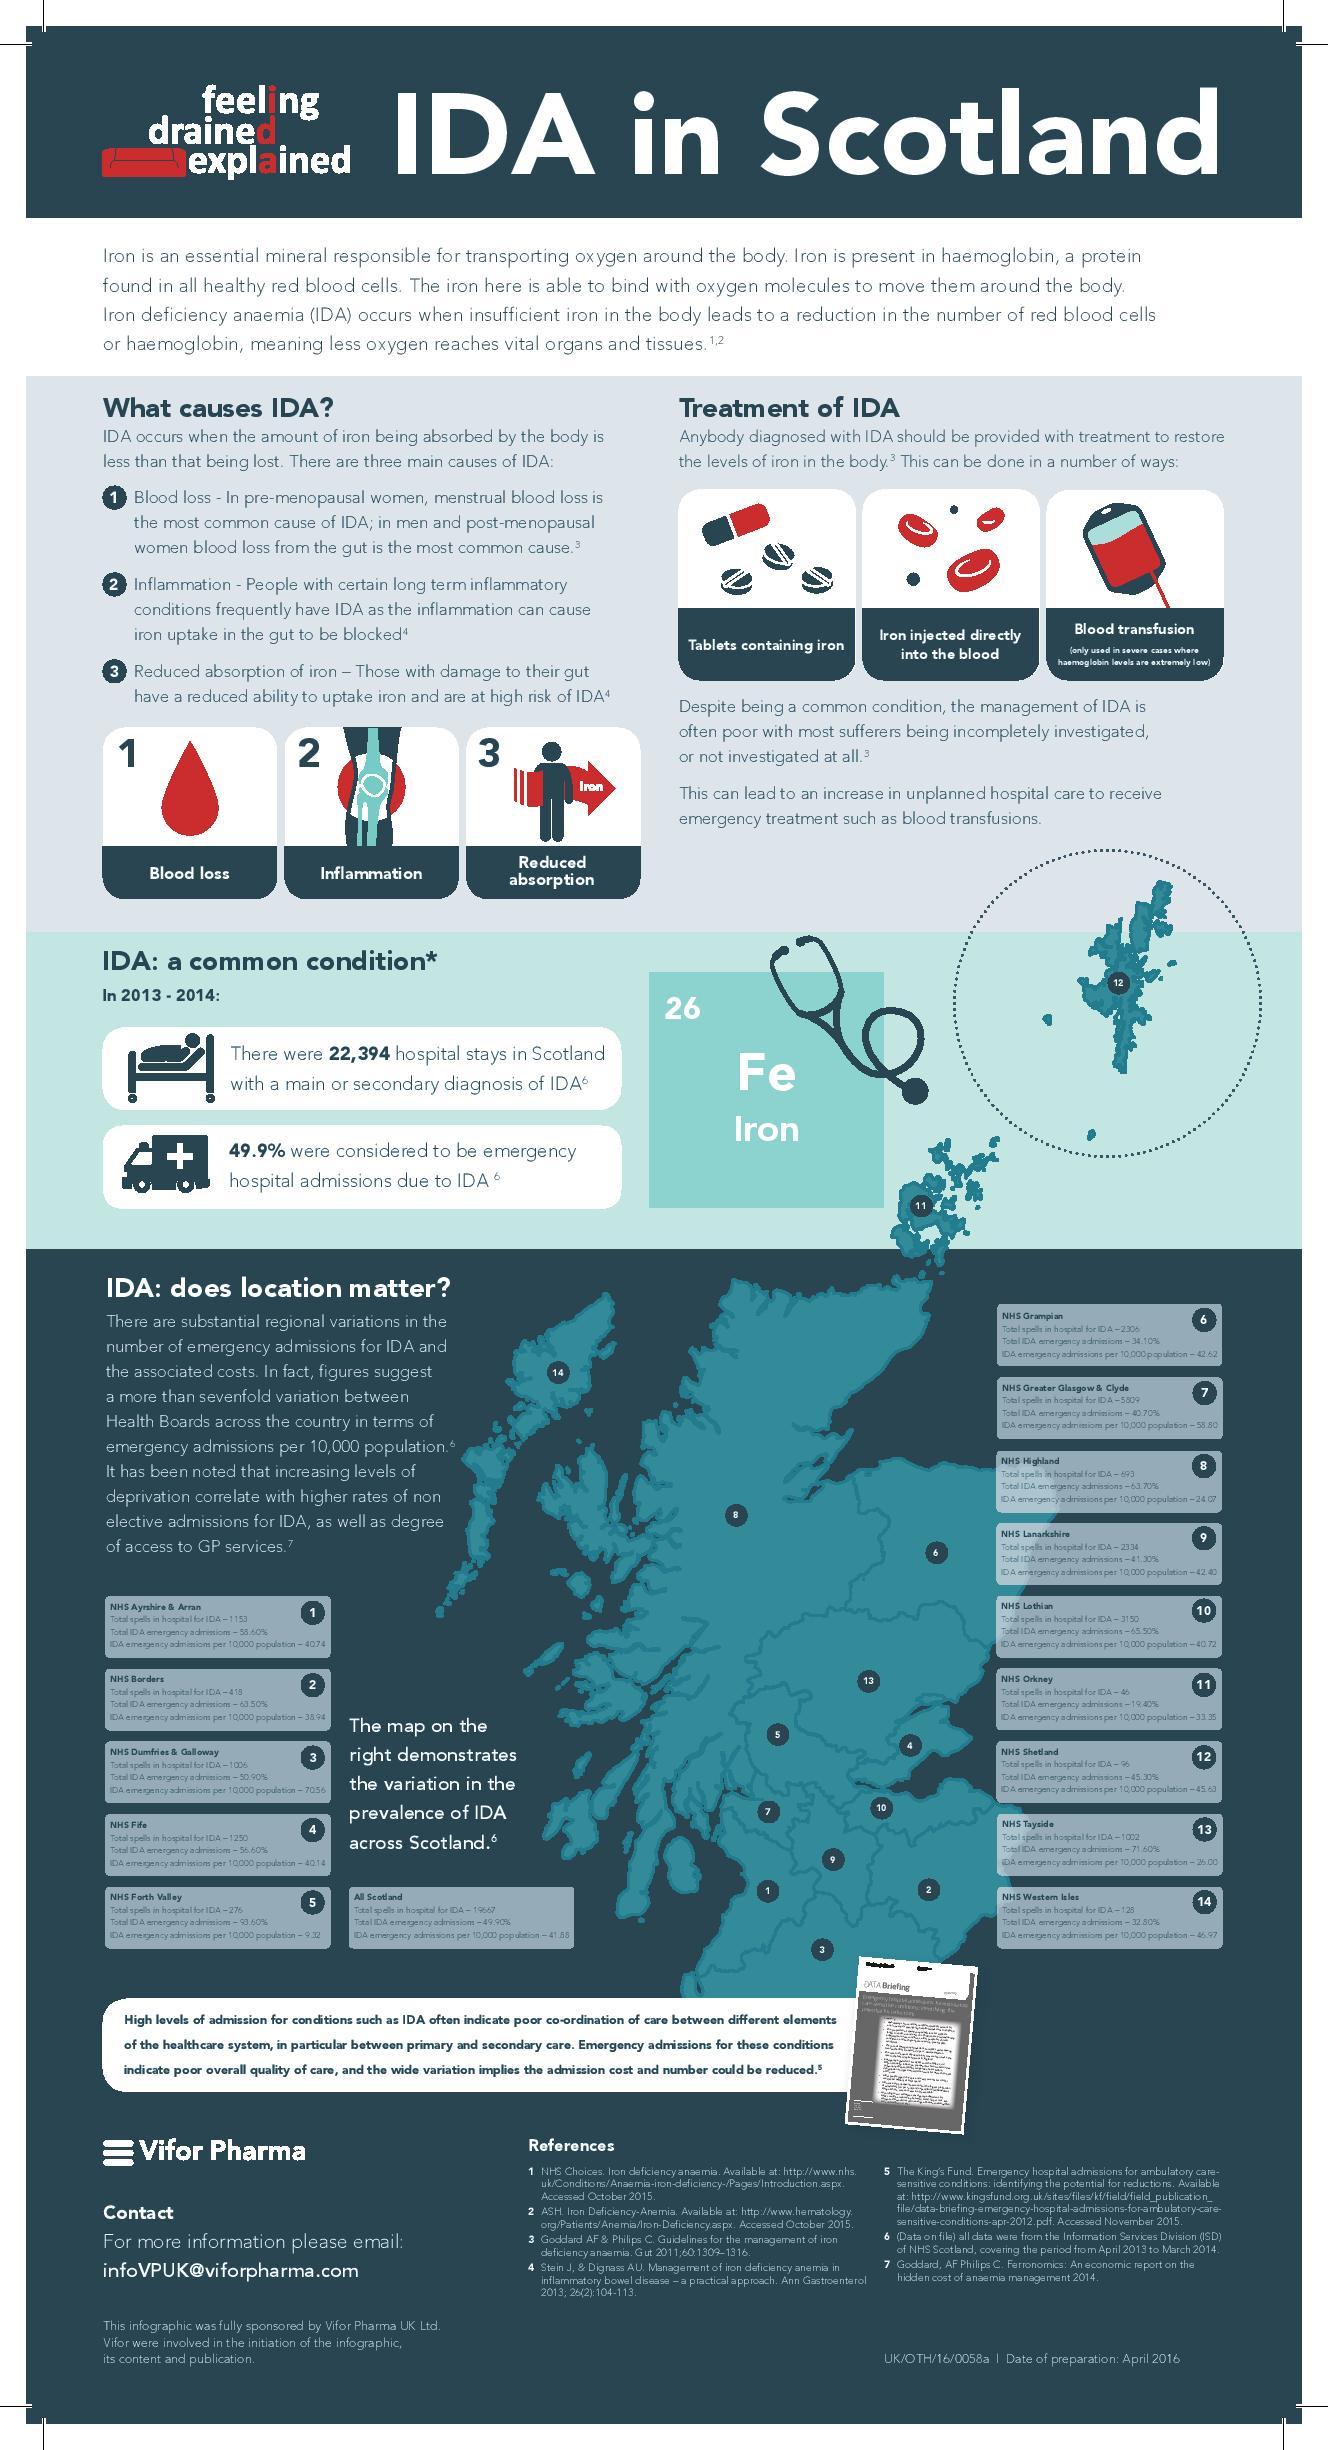 IDA_Infographic_EDINBURGH_120416-page-001.jpg